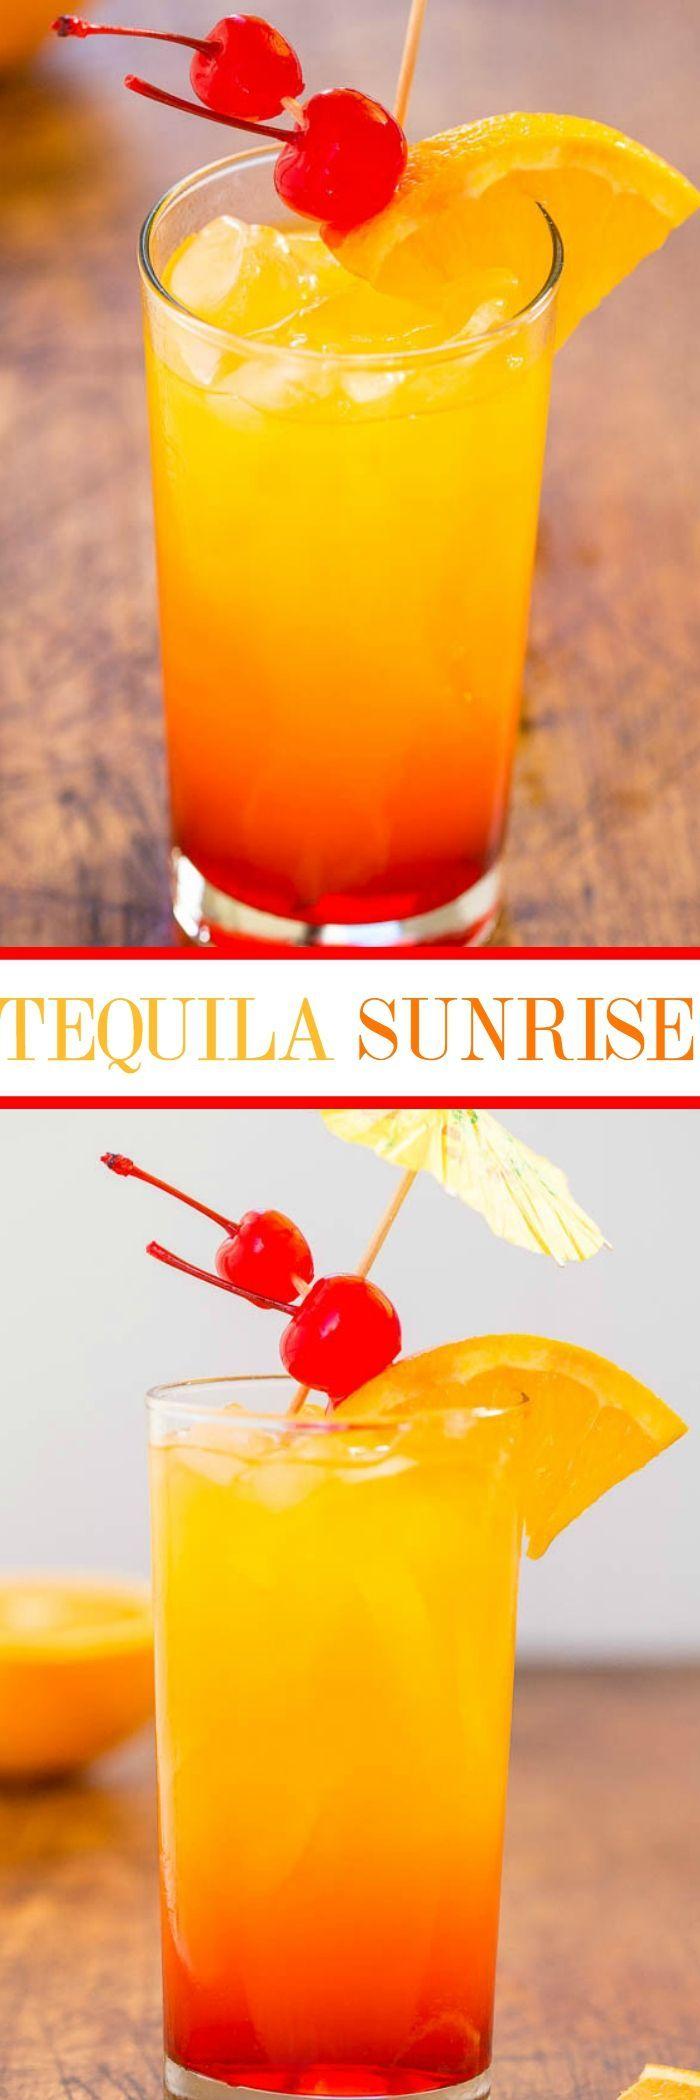 152 Best Cocktails Images On Pinterest Cocktail Recipes